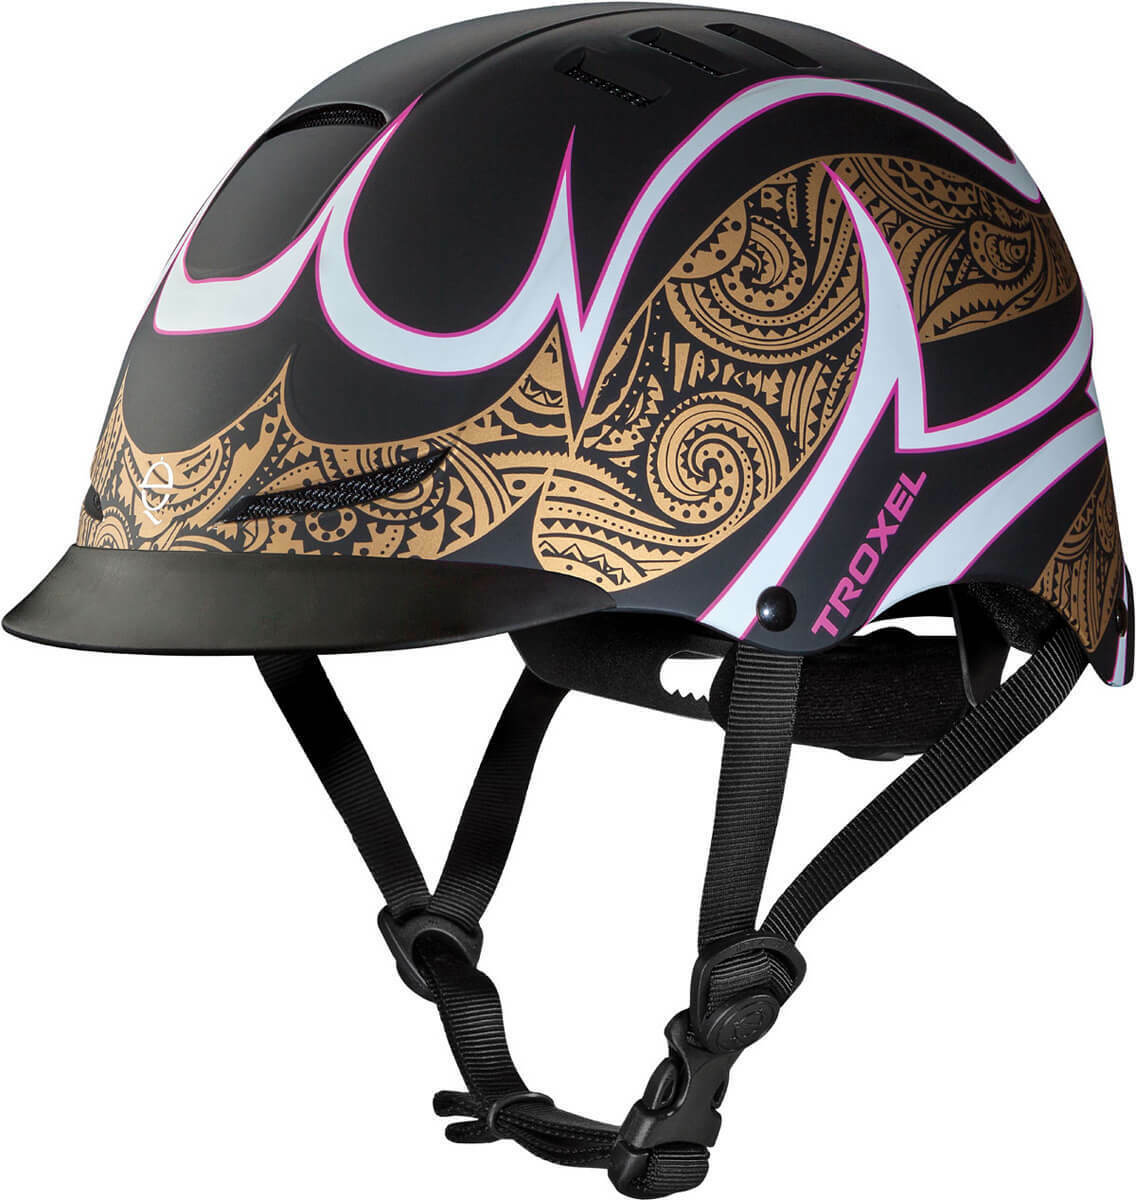 Weaver Inferno Fallon Taylor FTX Horse Riding Helmet